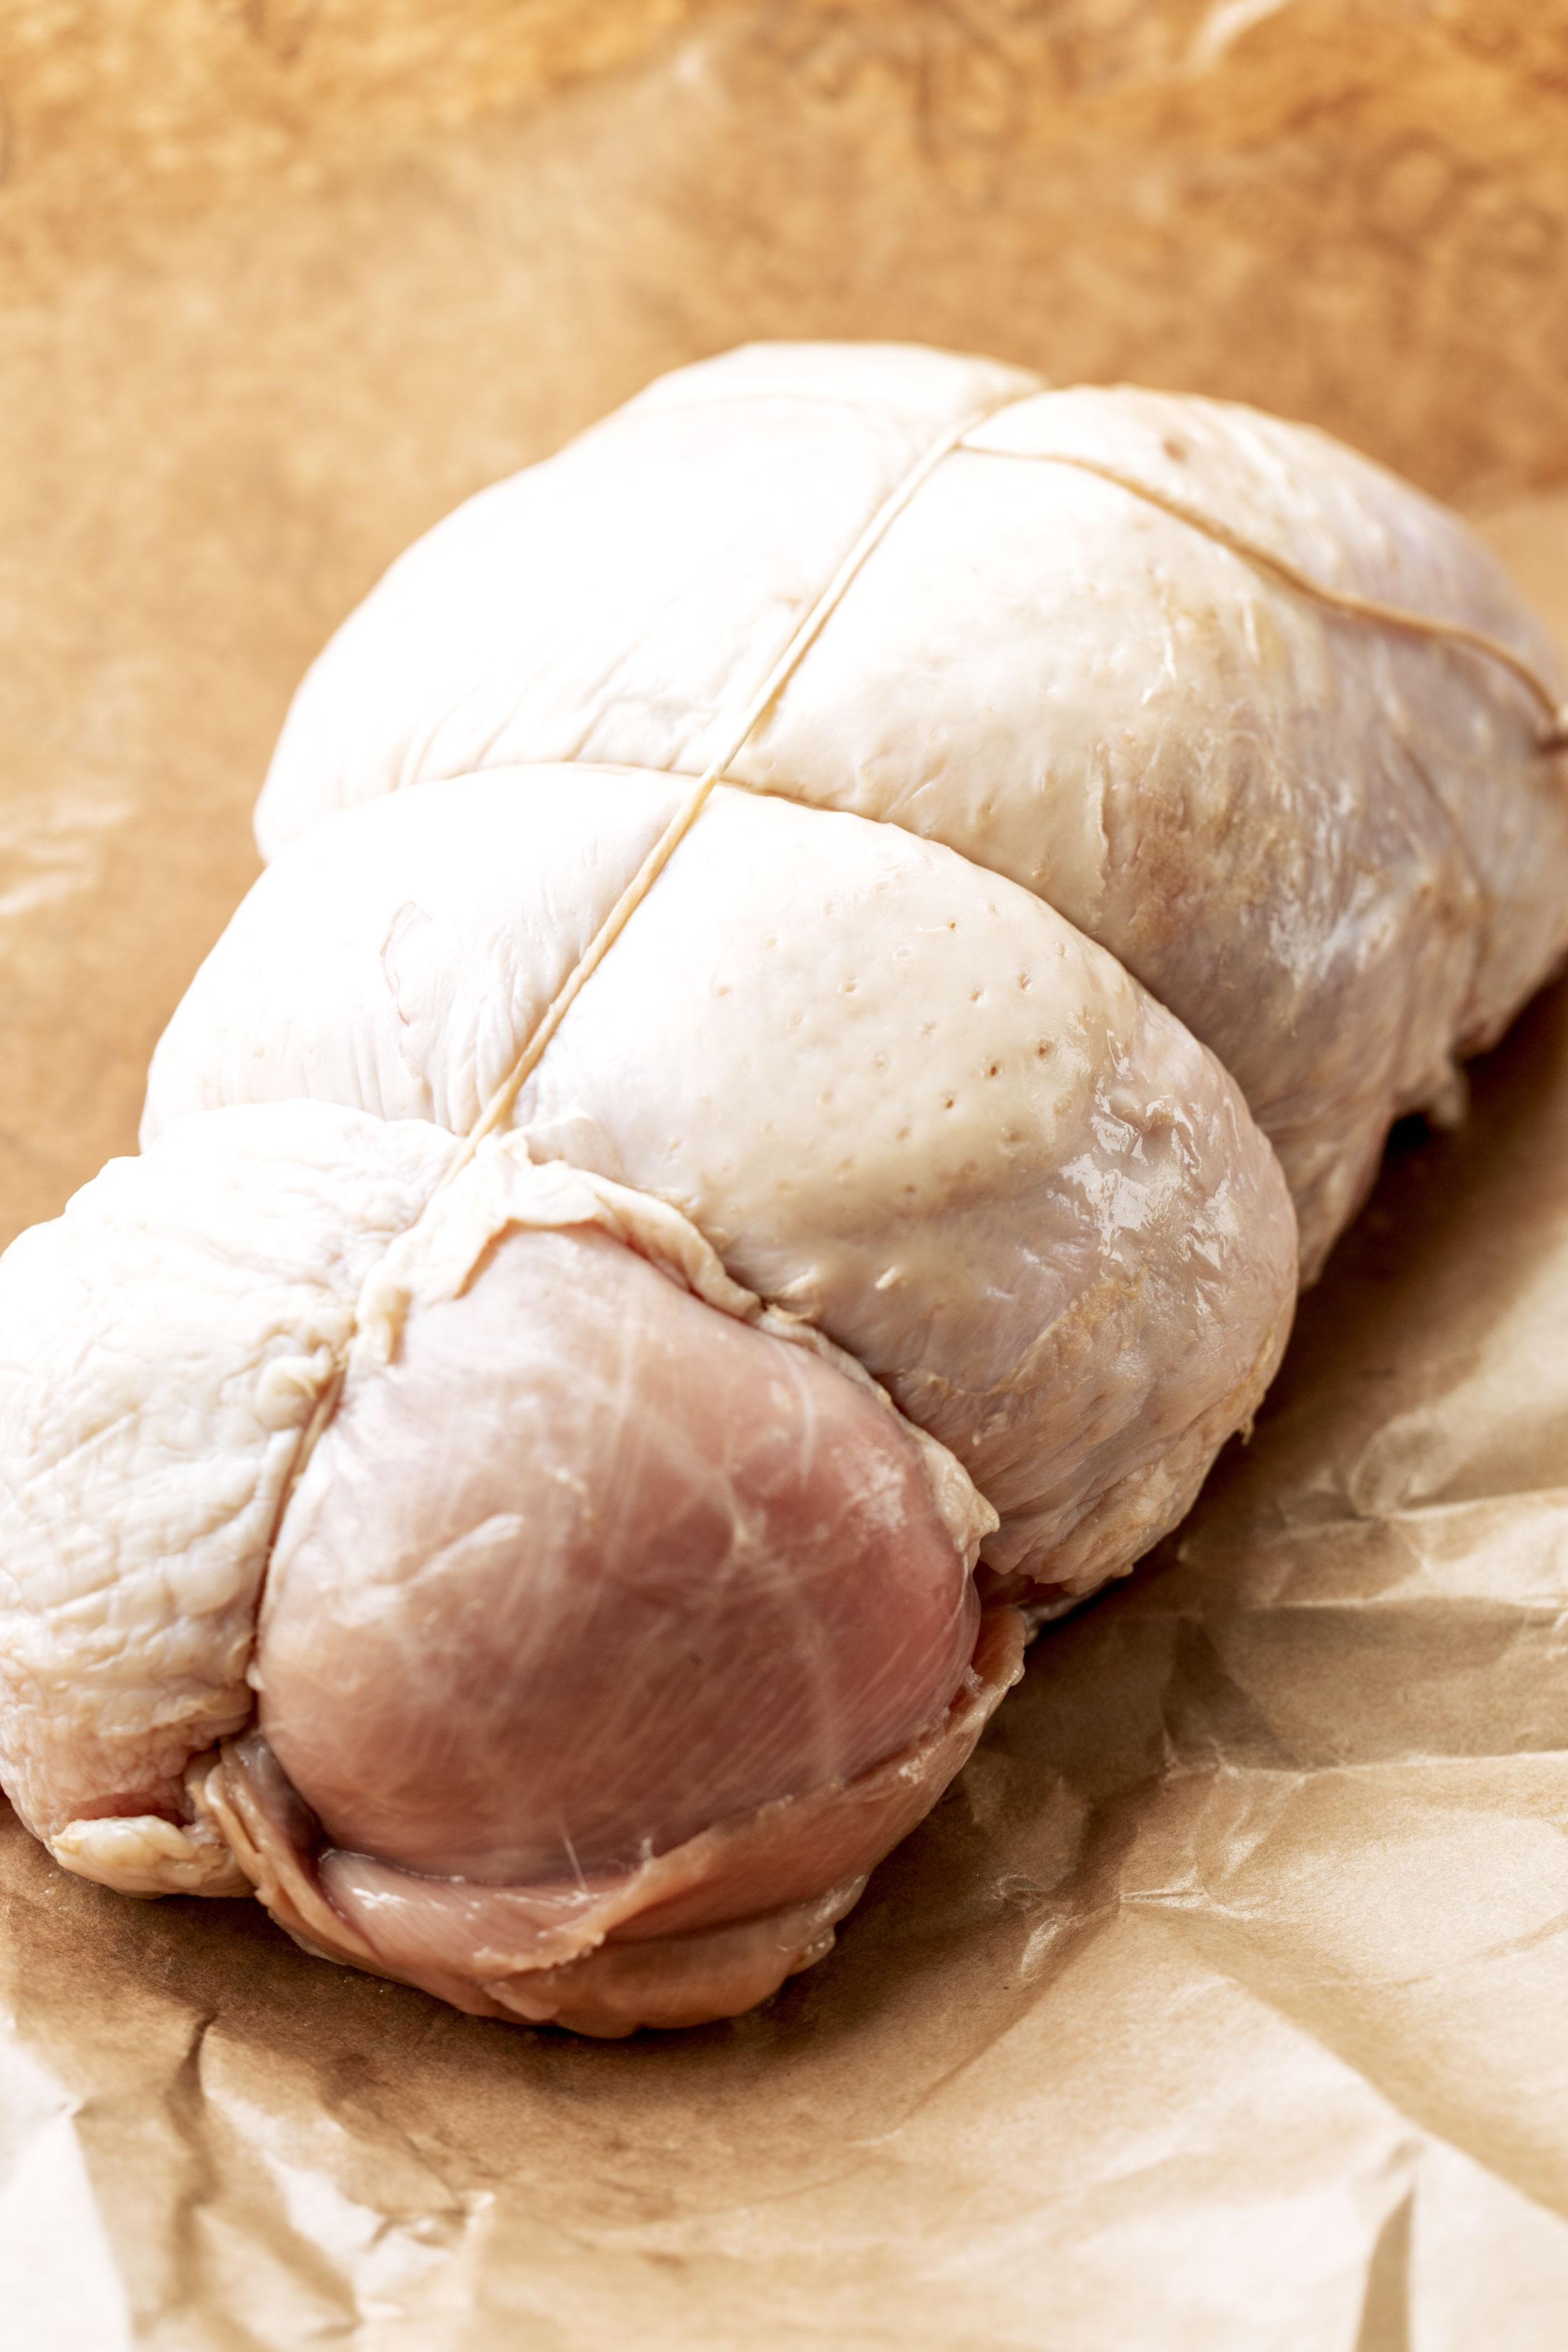 turkey-roulades-with-sausage-cornbread-stuffing-ingredients-2.jpg